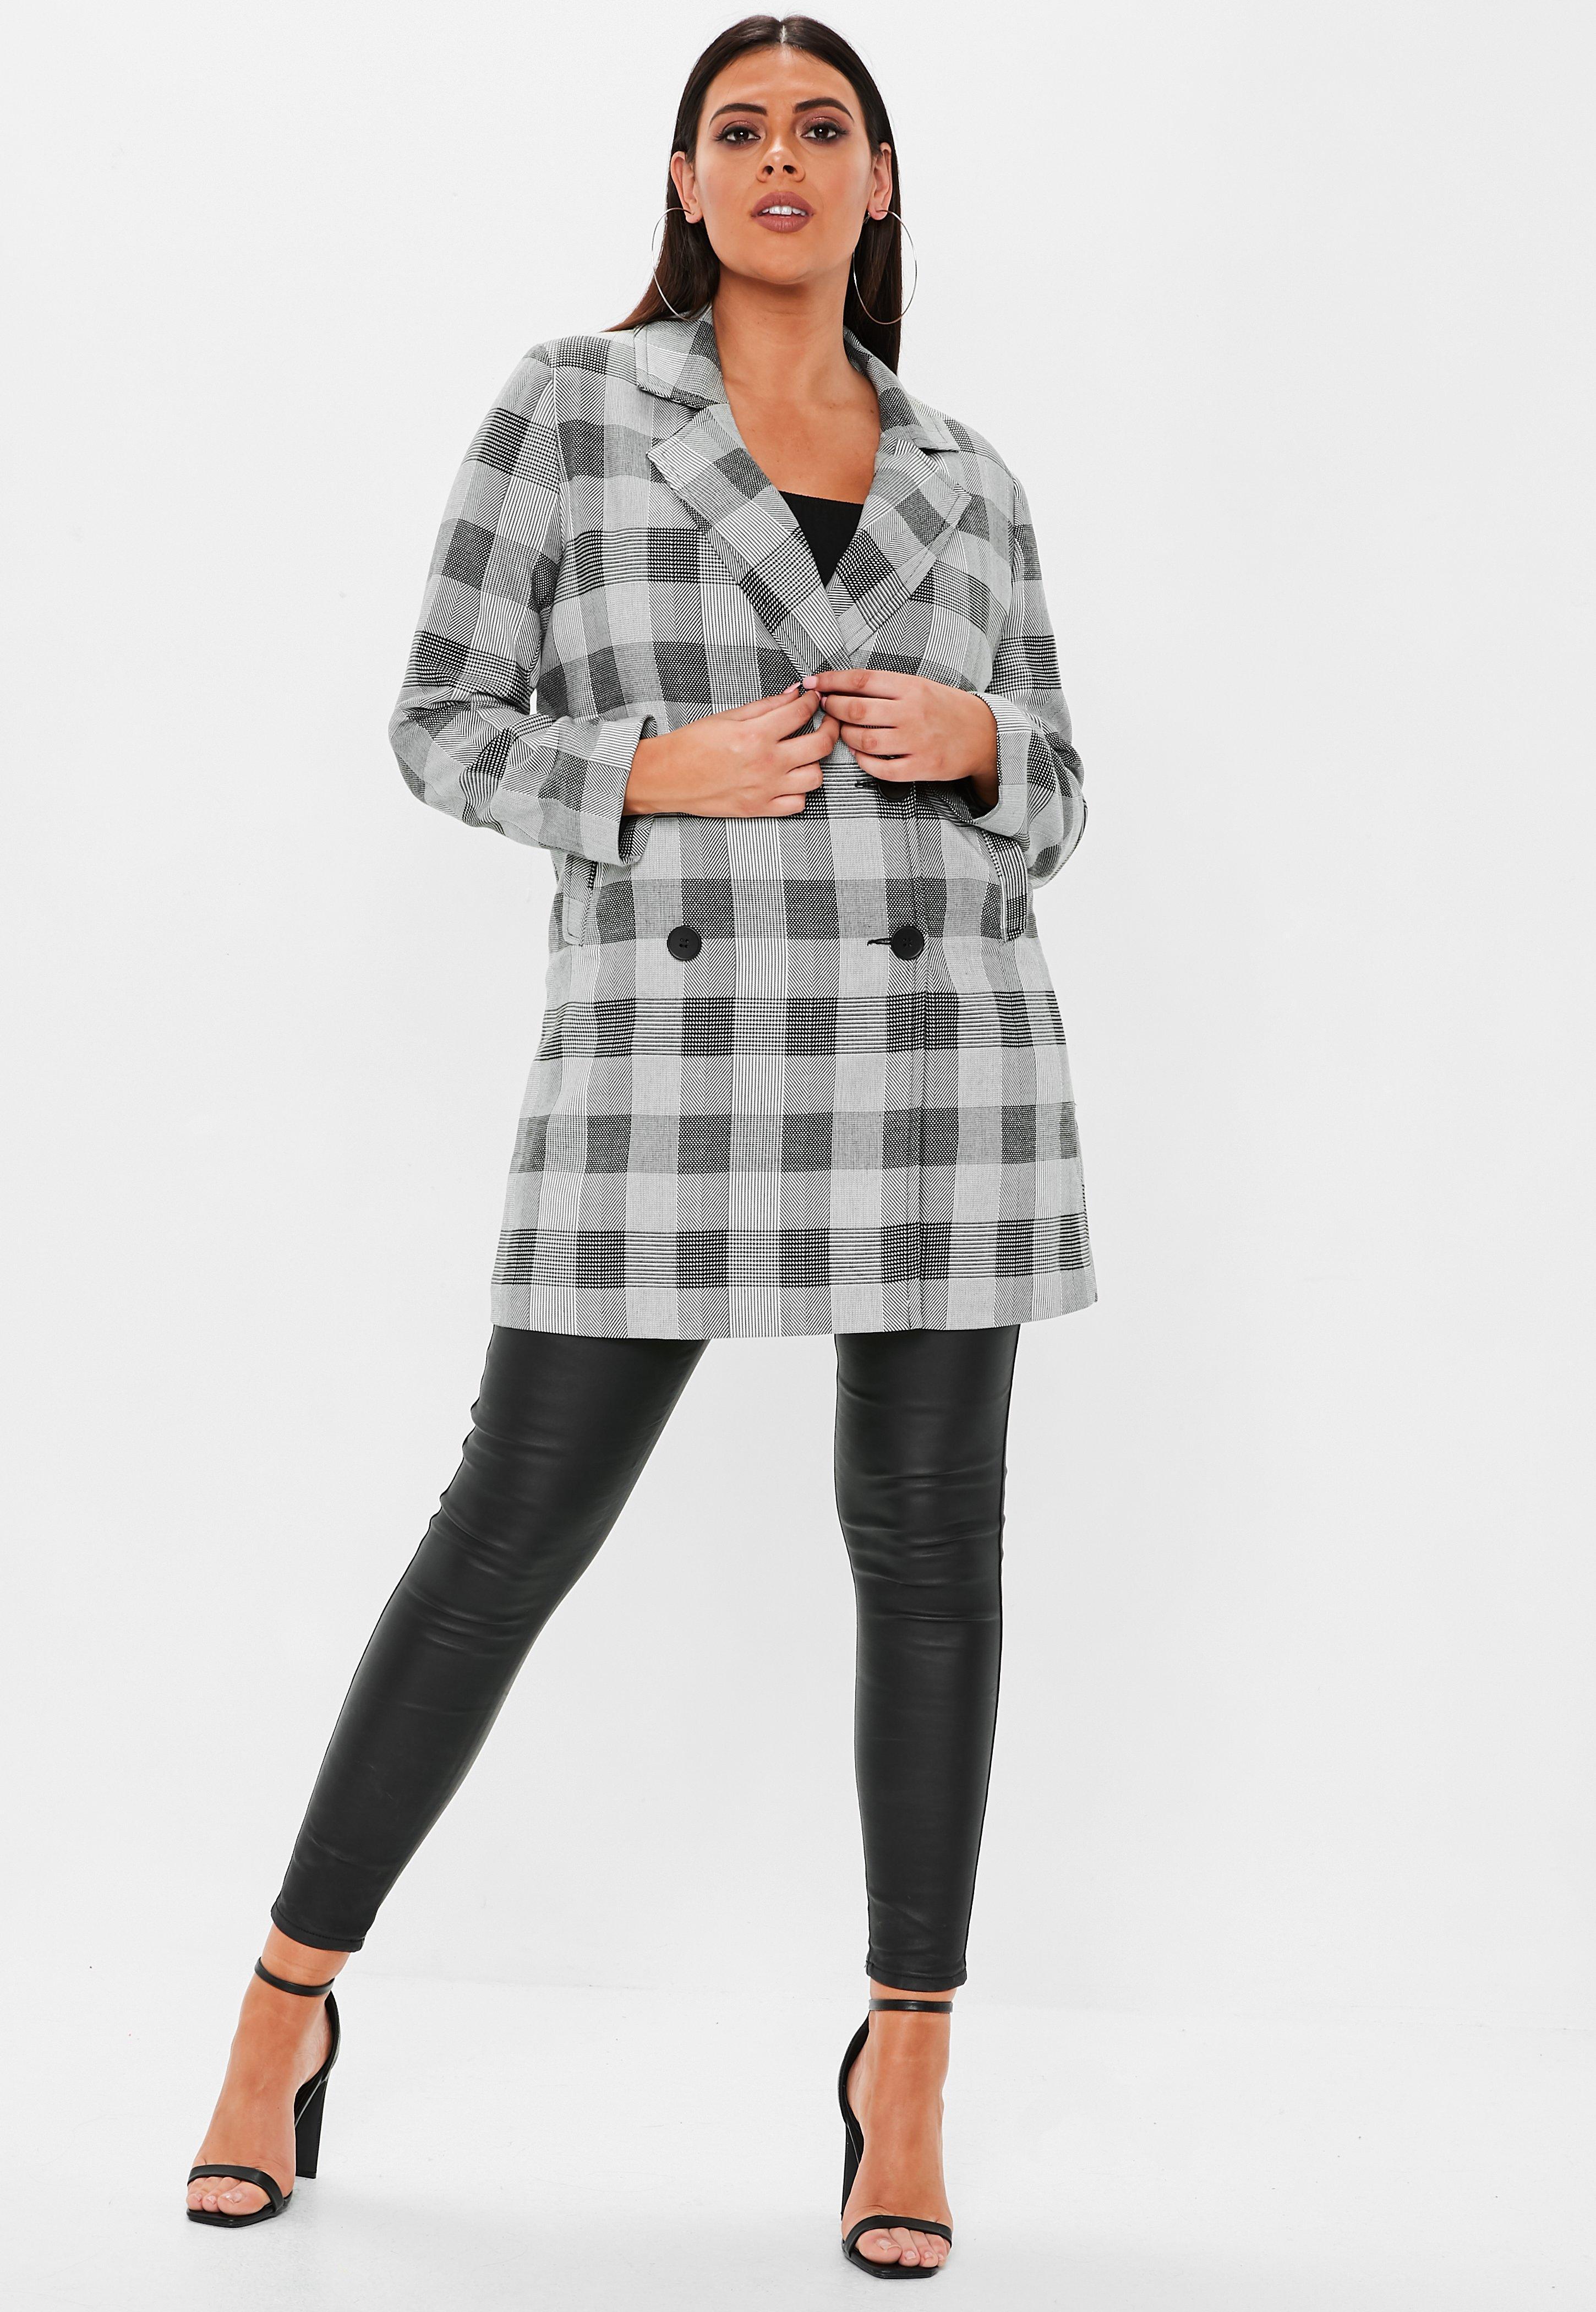 8cda9e8046eac Sale - Cheap Clothes for Women Online - Missguided Australia